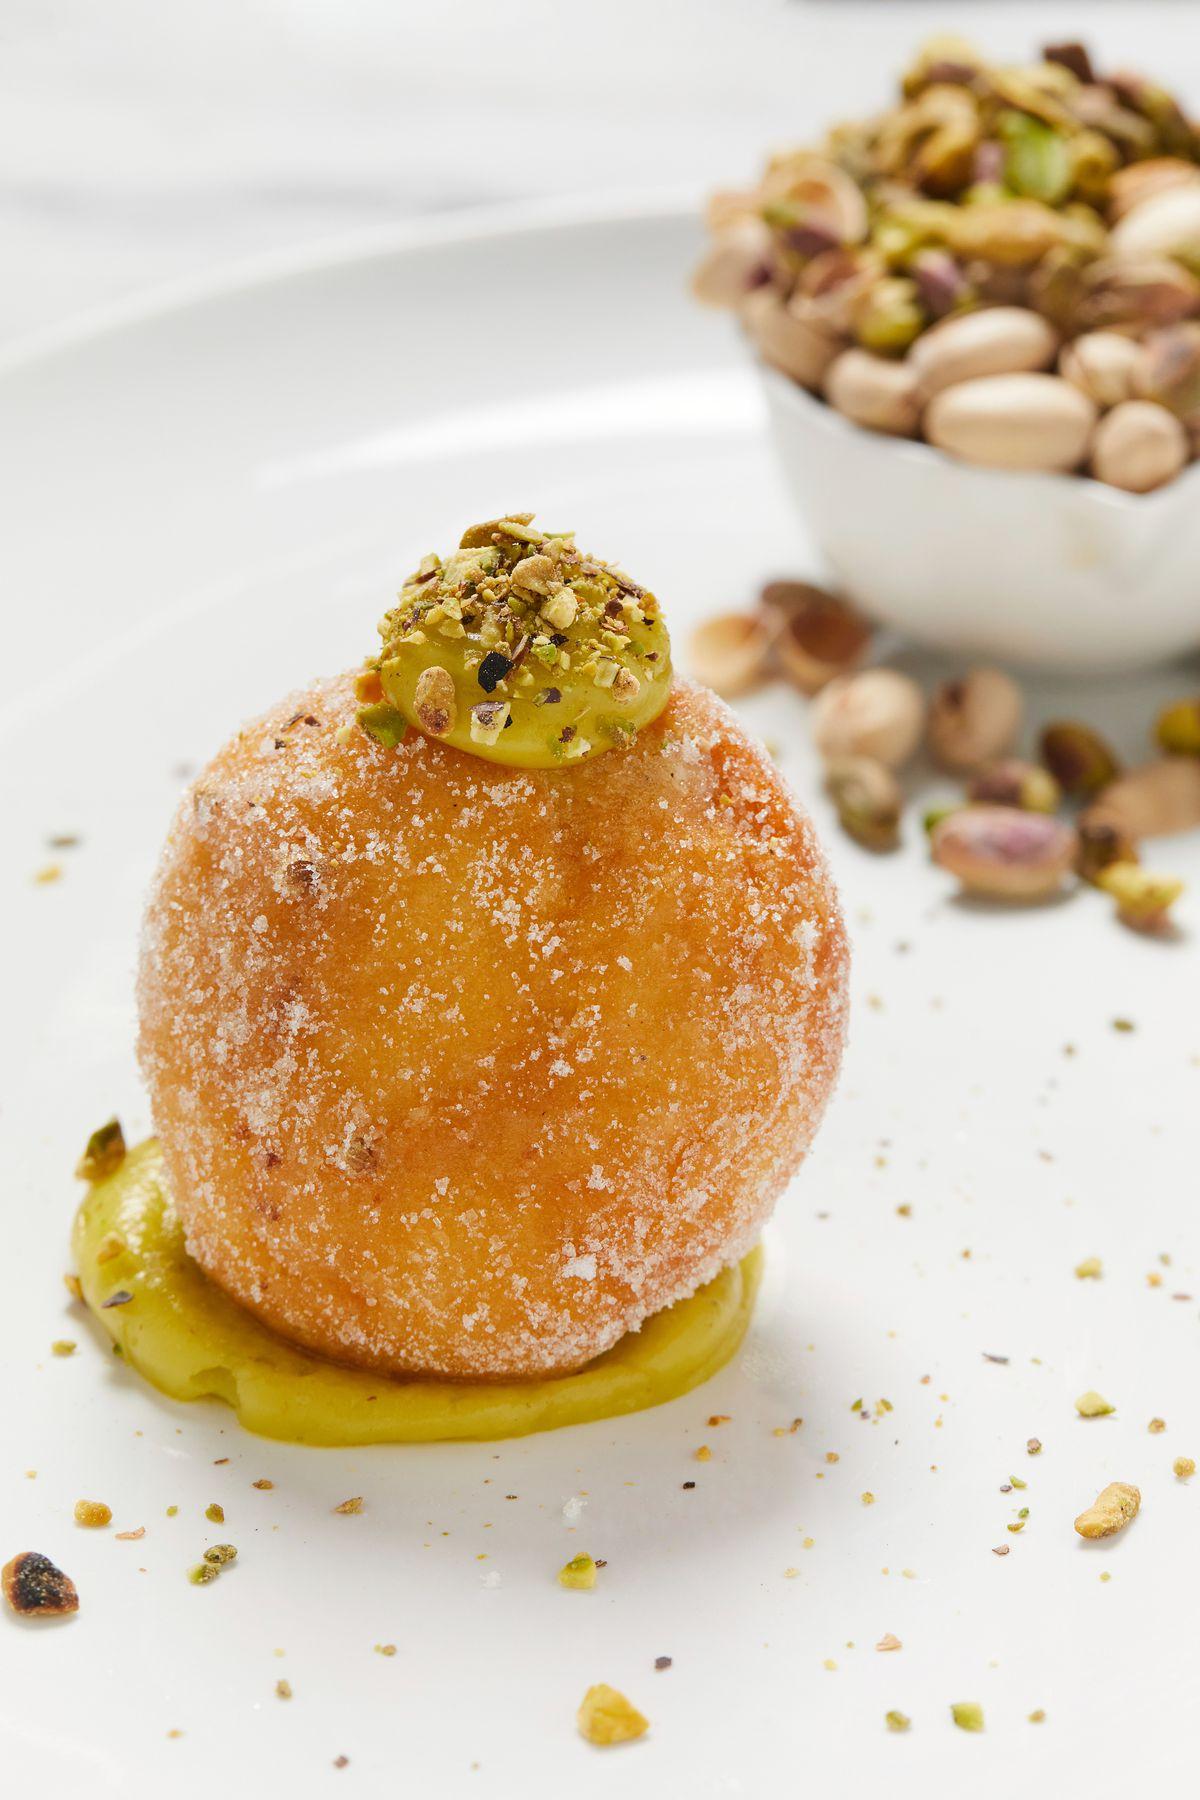 A pistachio doughnut from Toscana Market